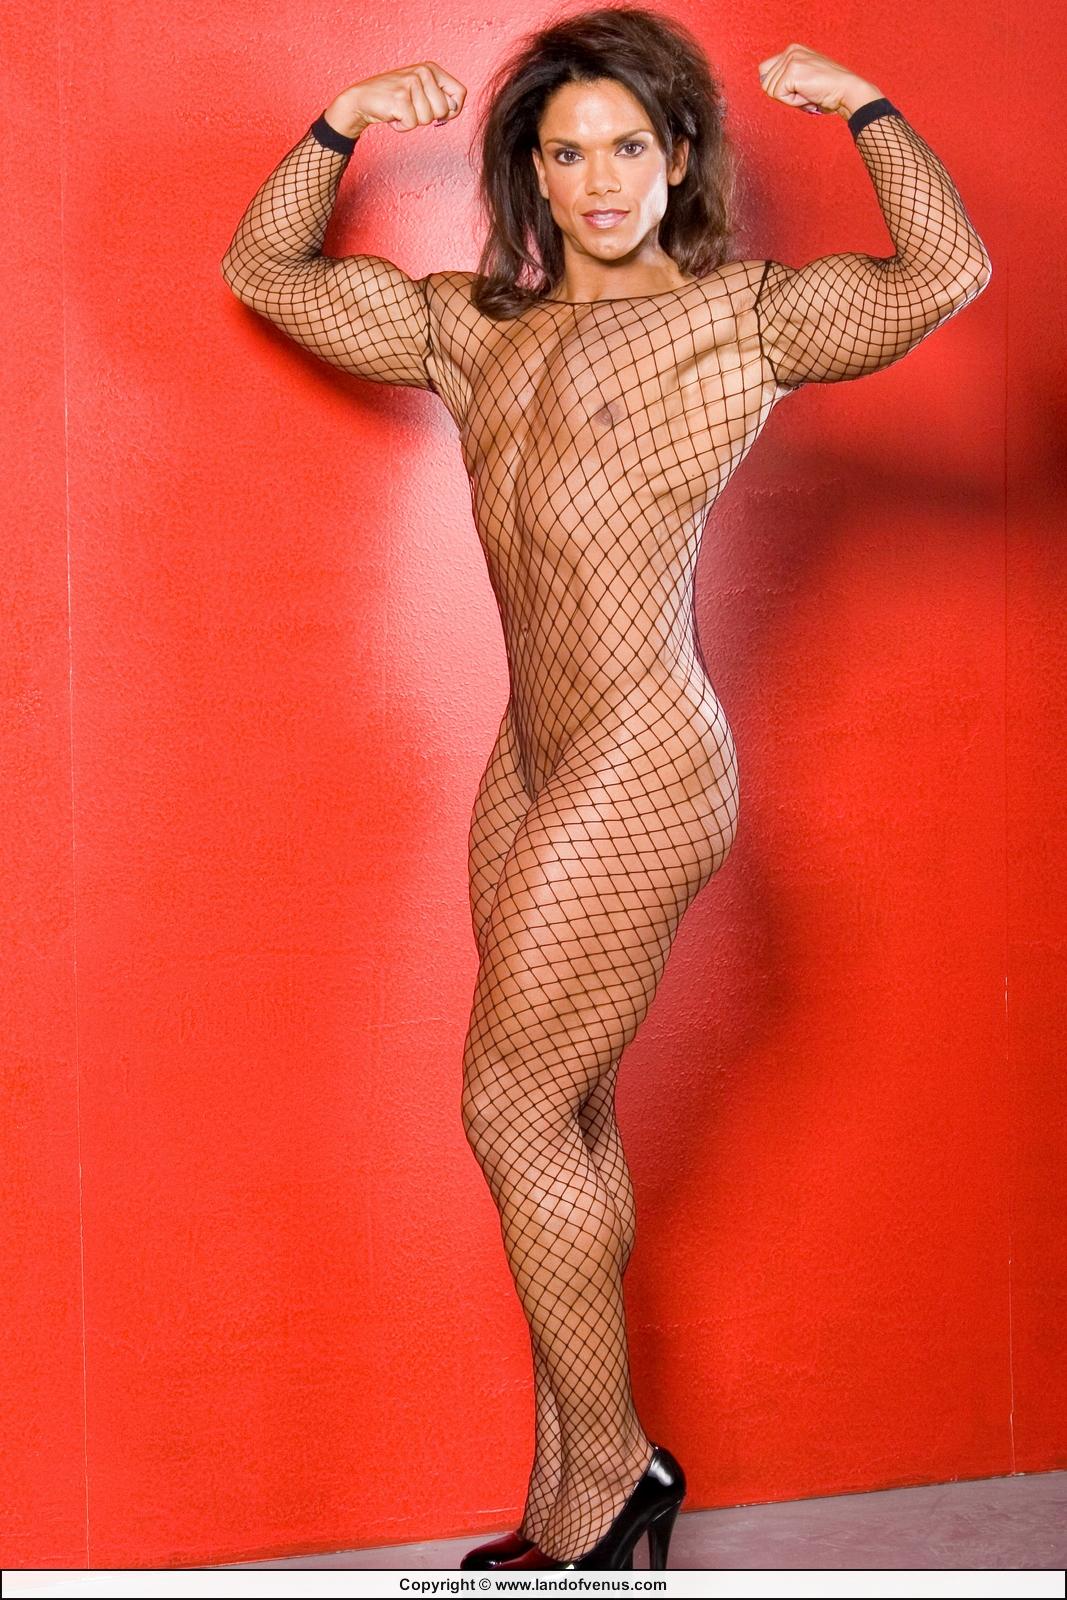 Naked Women Bodybuilders  Hot Girl Hd Wallpaper-6976